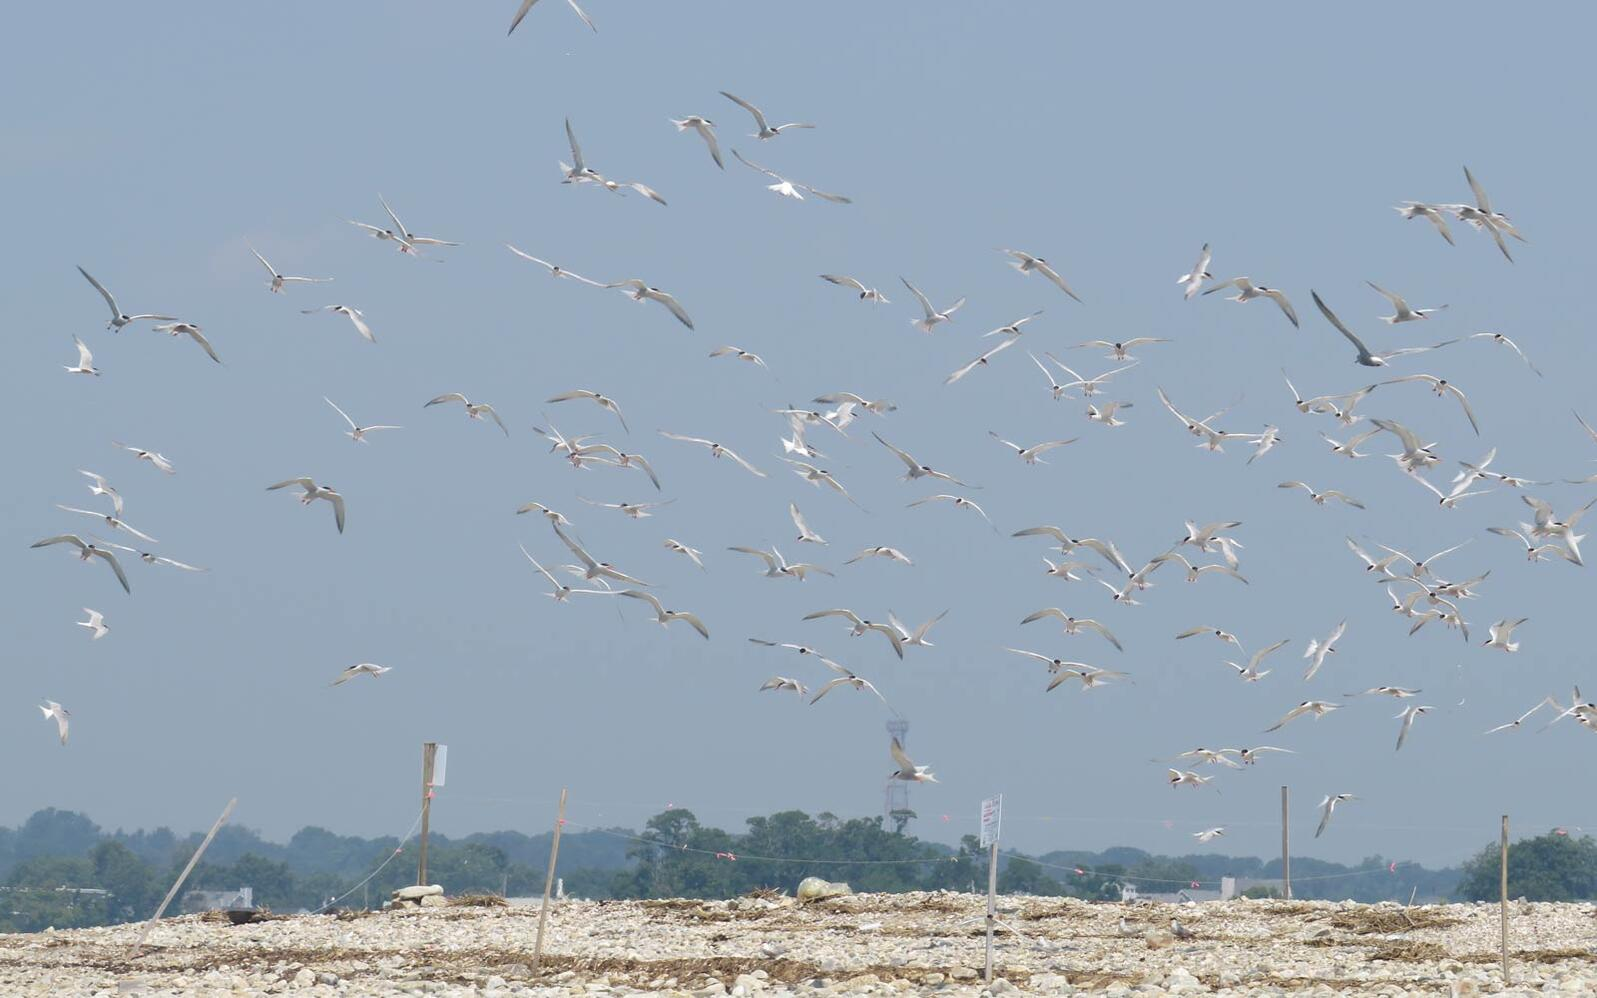 Flock of terns in flight on beach, seemingly disturbed.